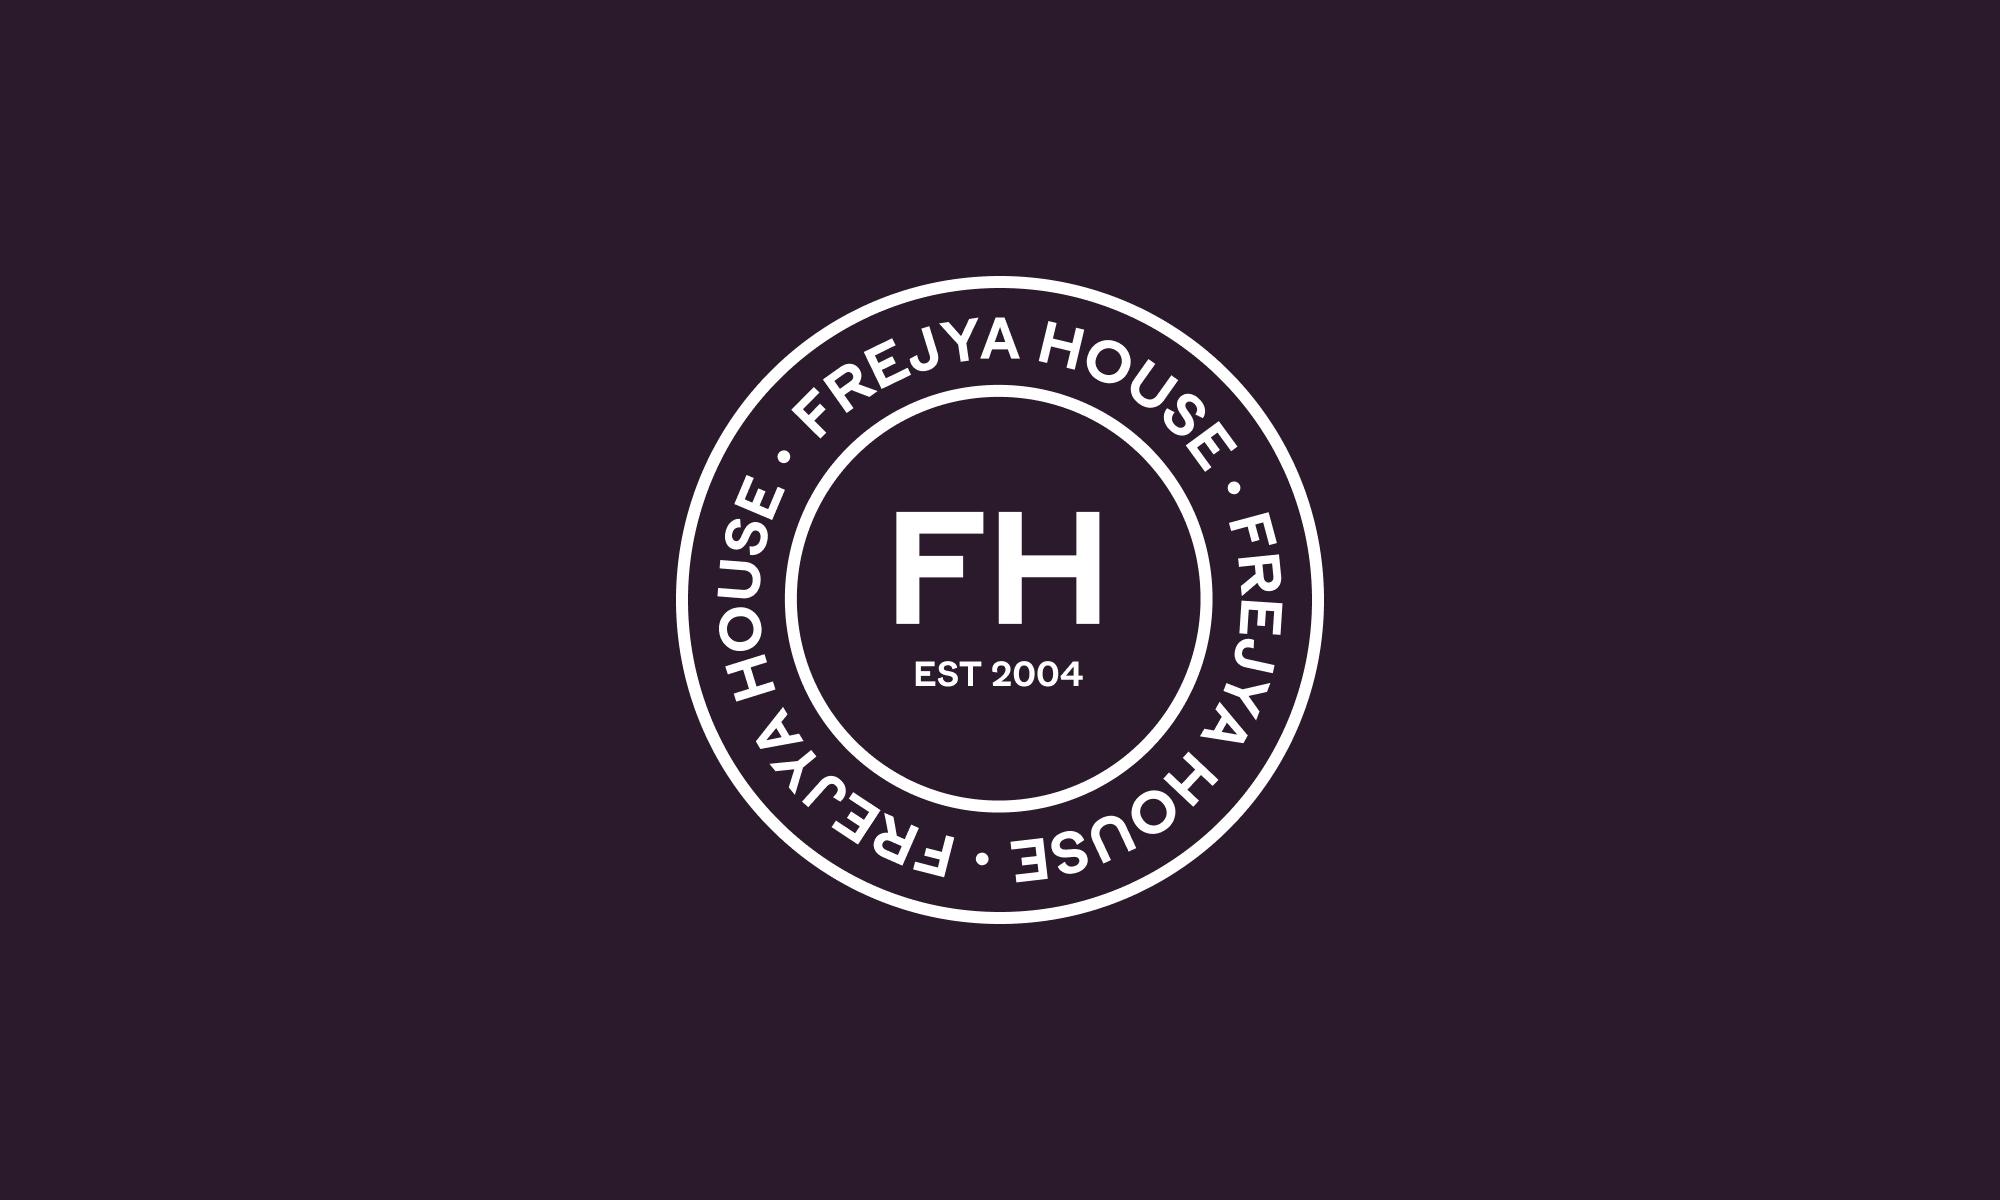 Frejya House Logo - Rohan Pal